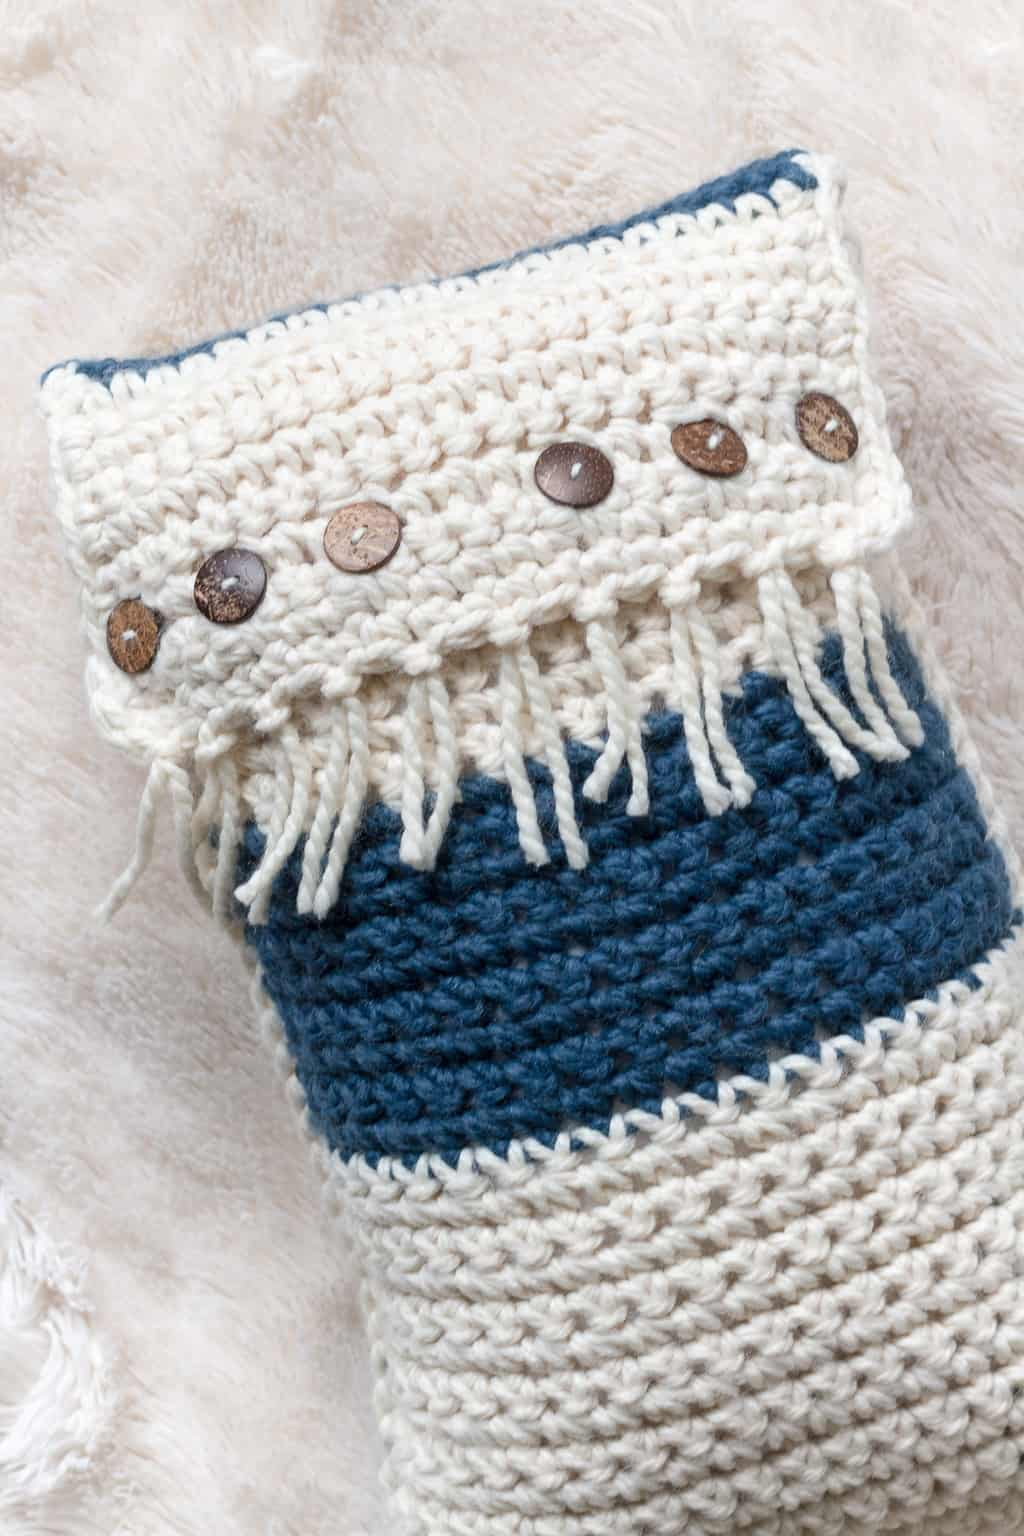 Coconut Button Crochet Pillow